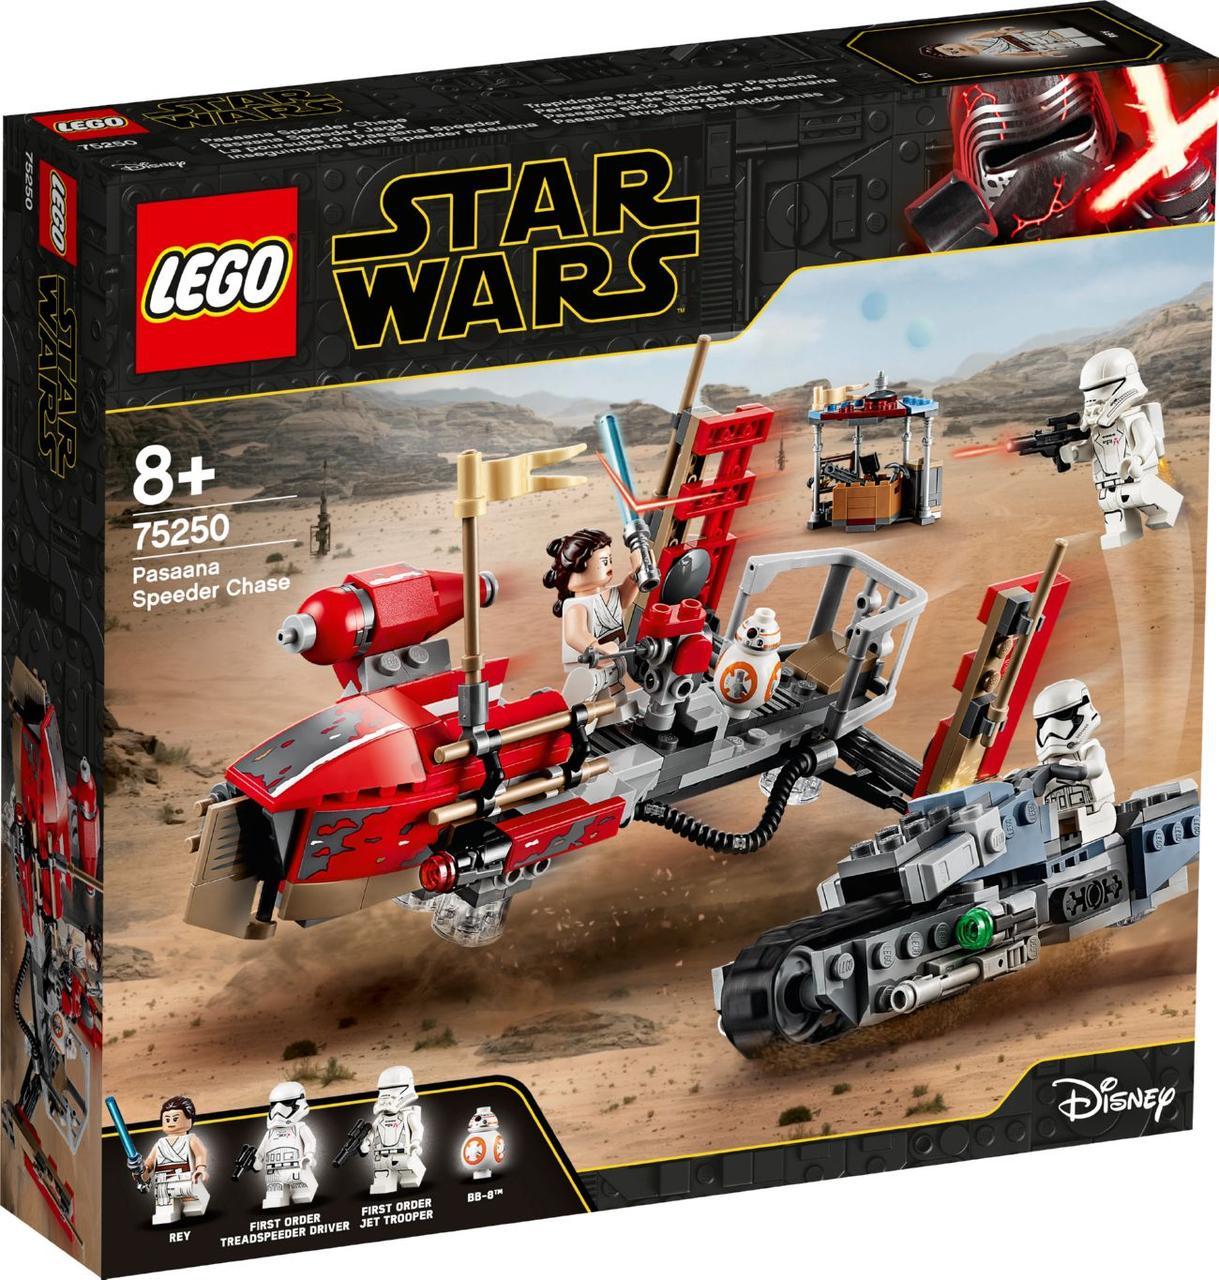 Детский Конструктор Lego Star Wars Погоня на спидерах 75250